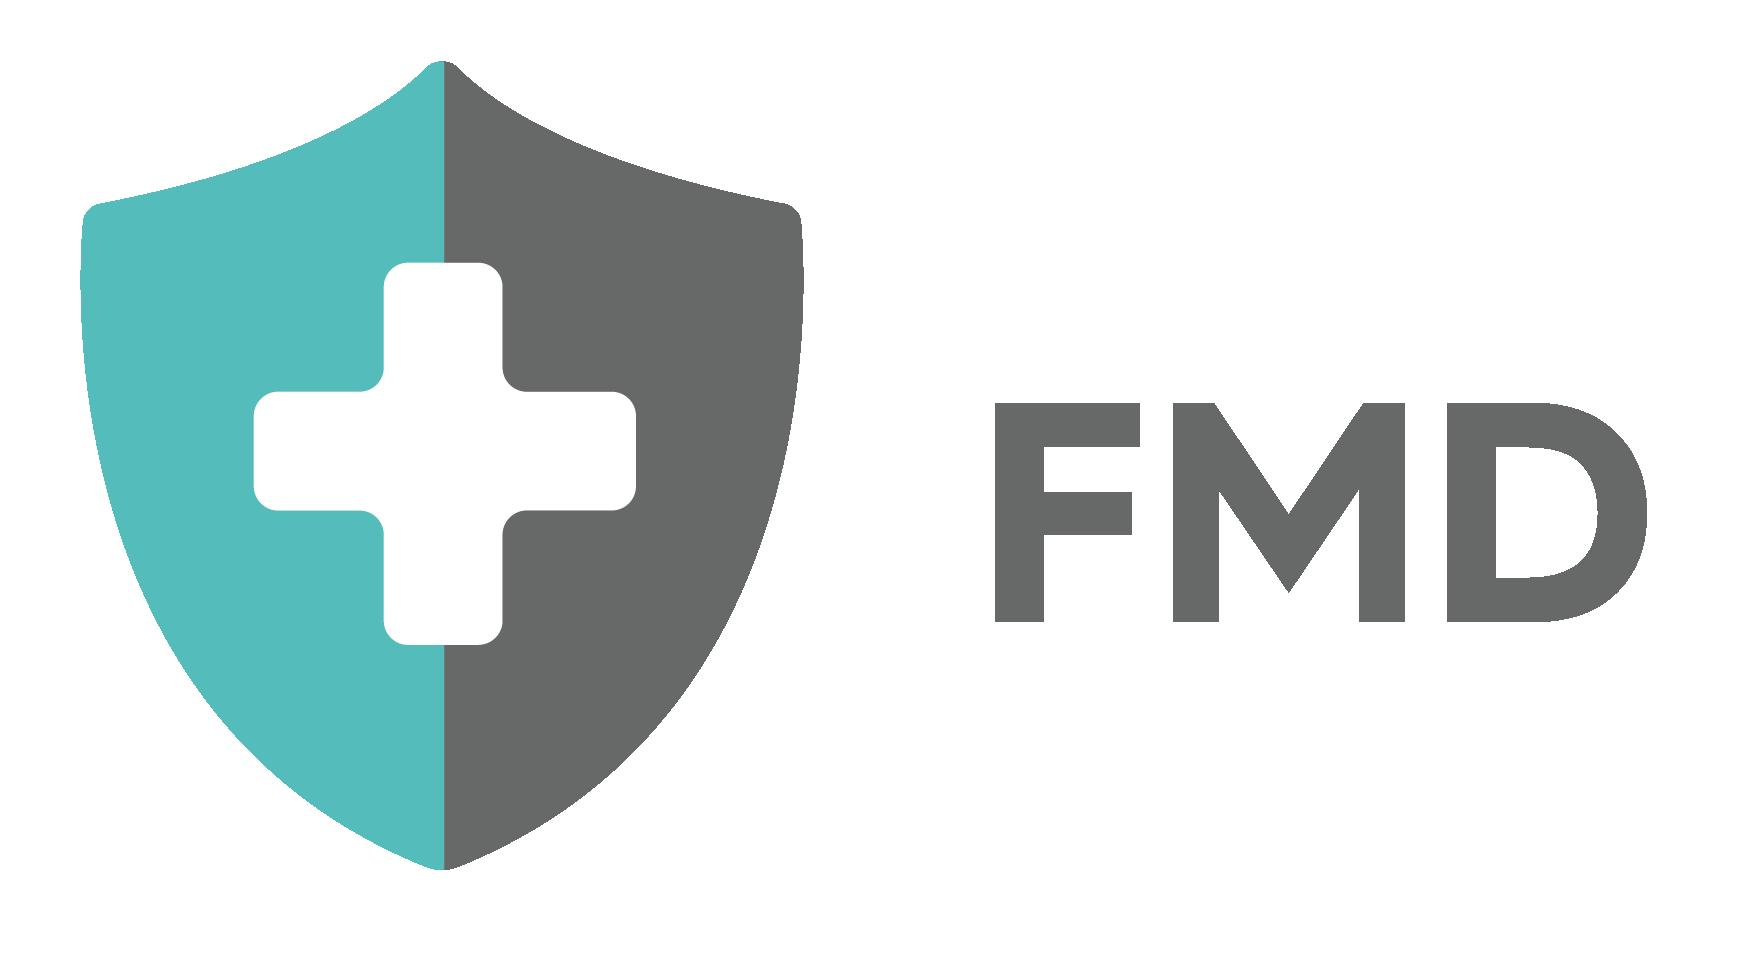 CHS_FMD logo